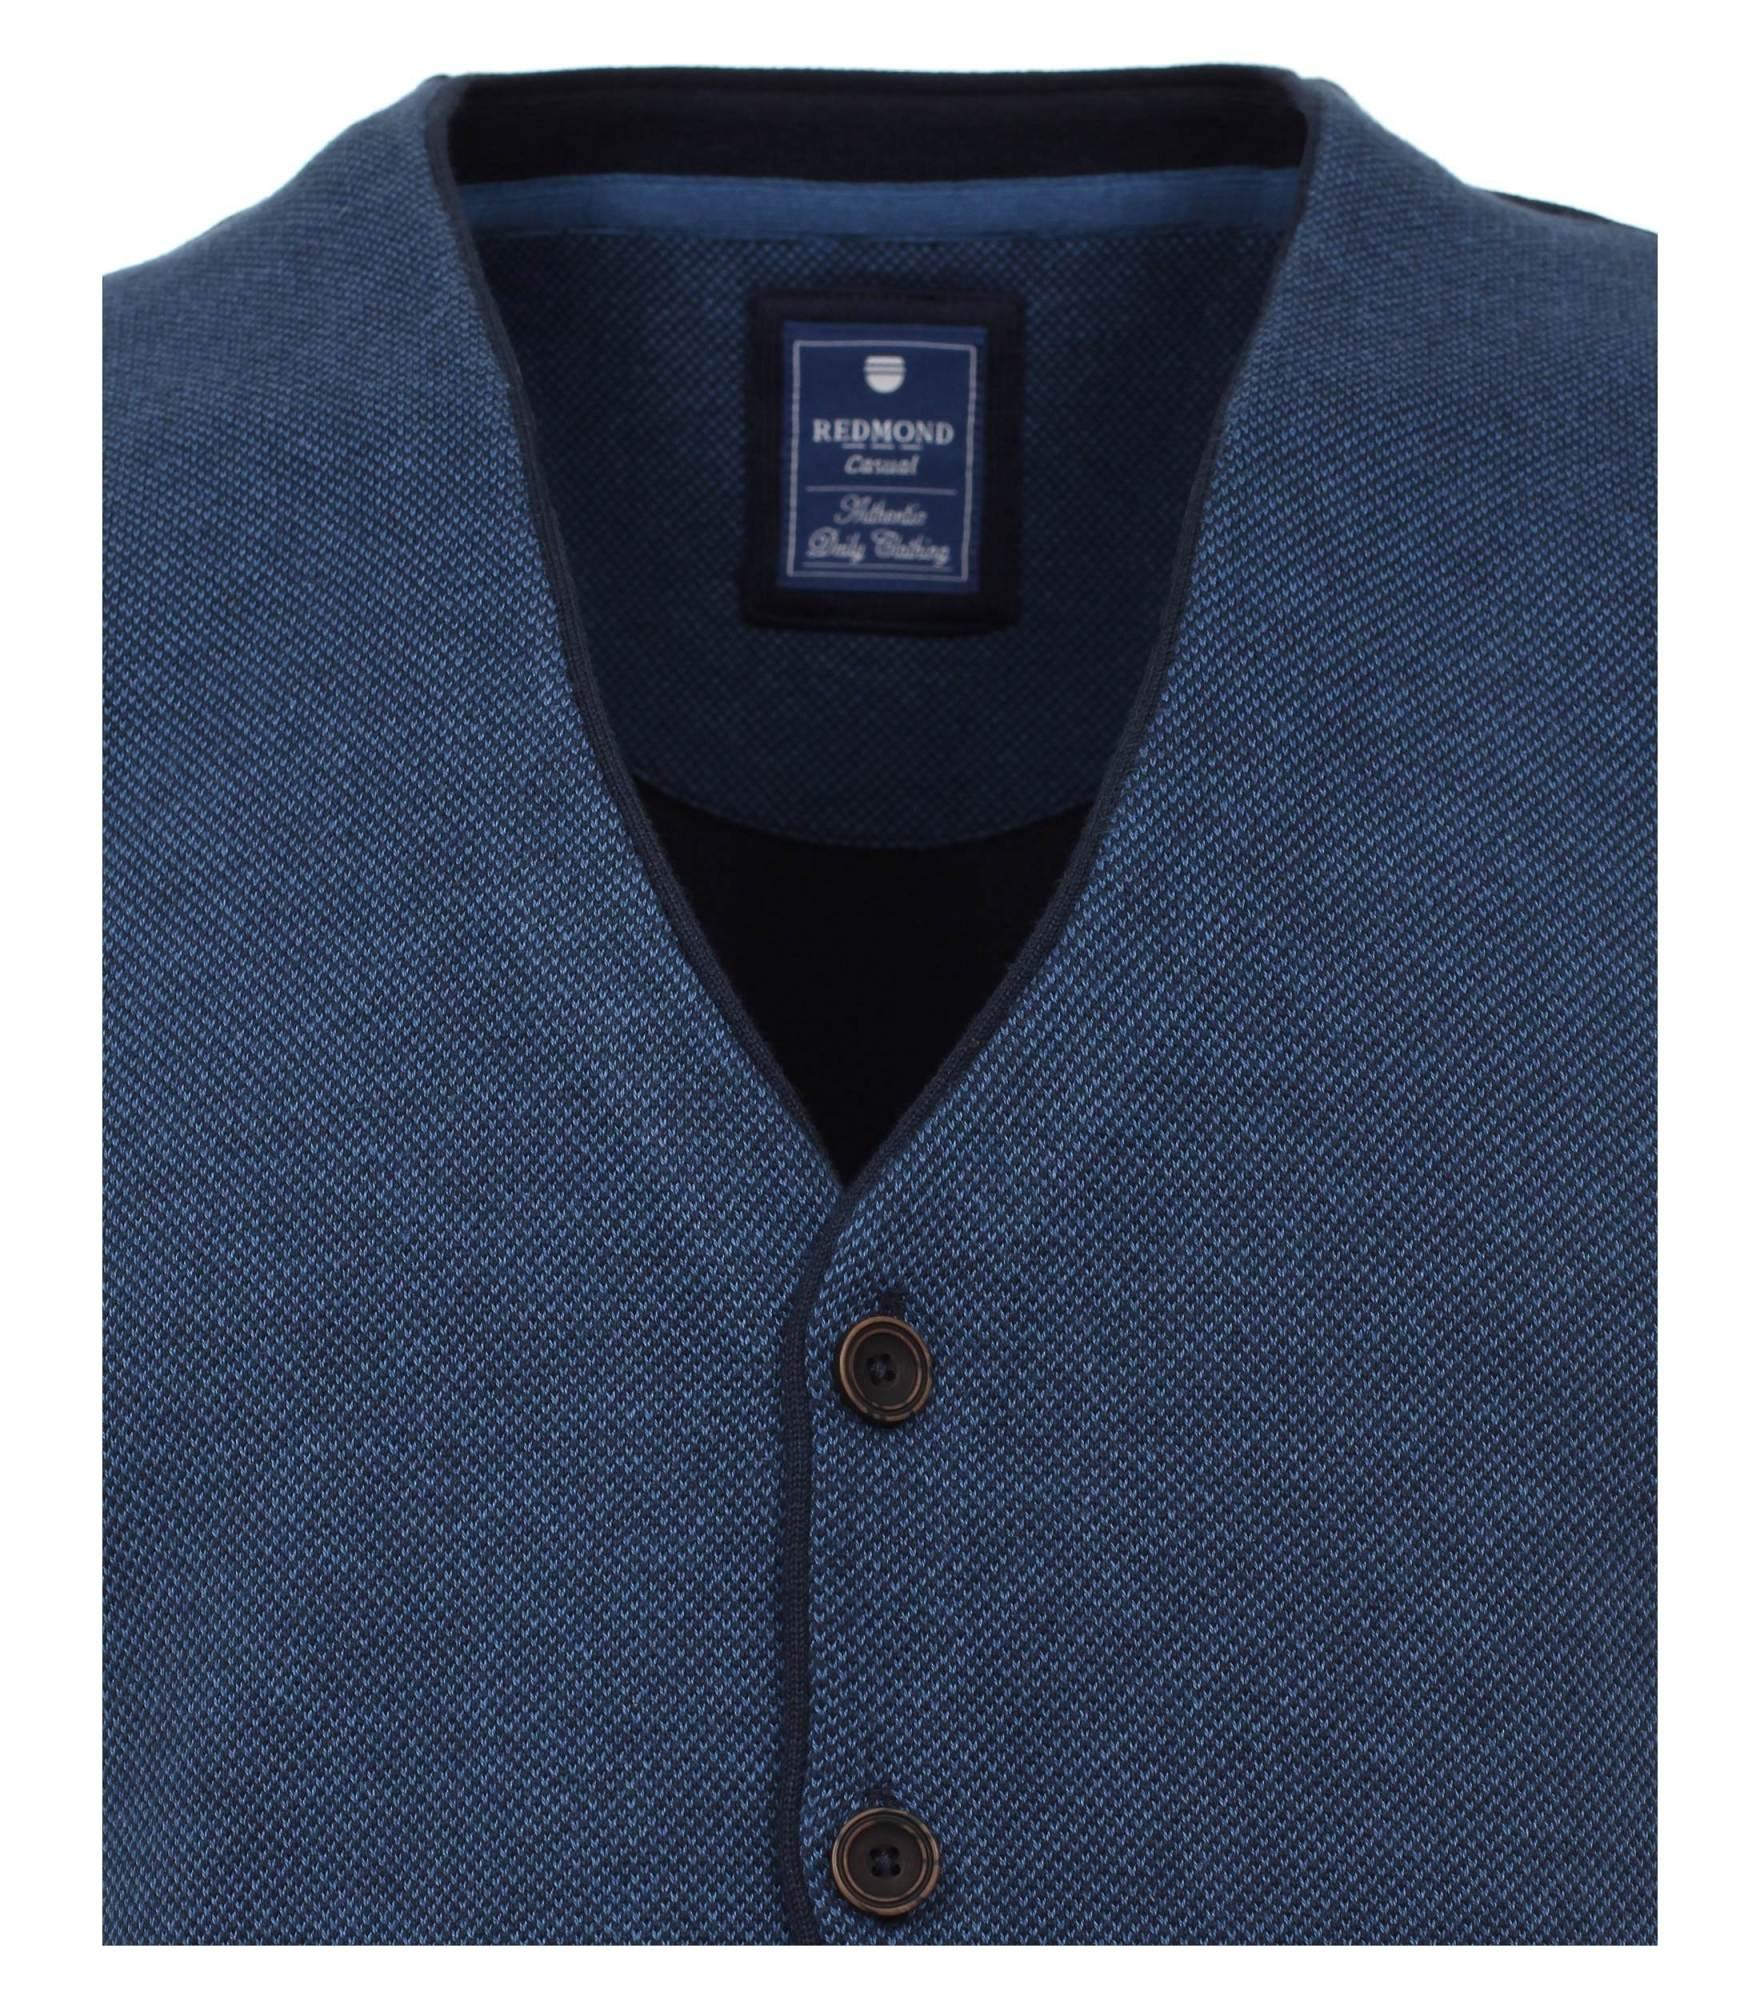 211815601 10 Blue back close up - - Con Murphys Menswear